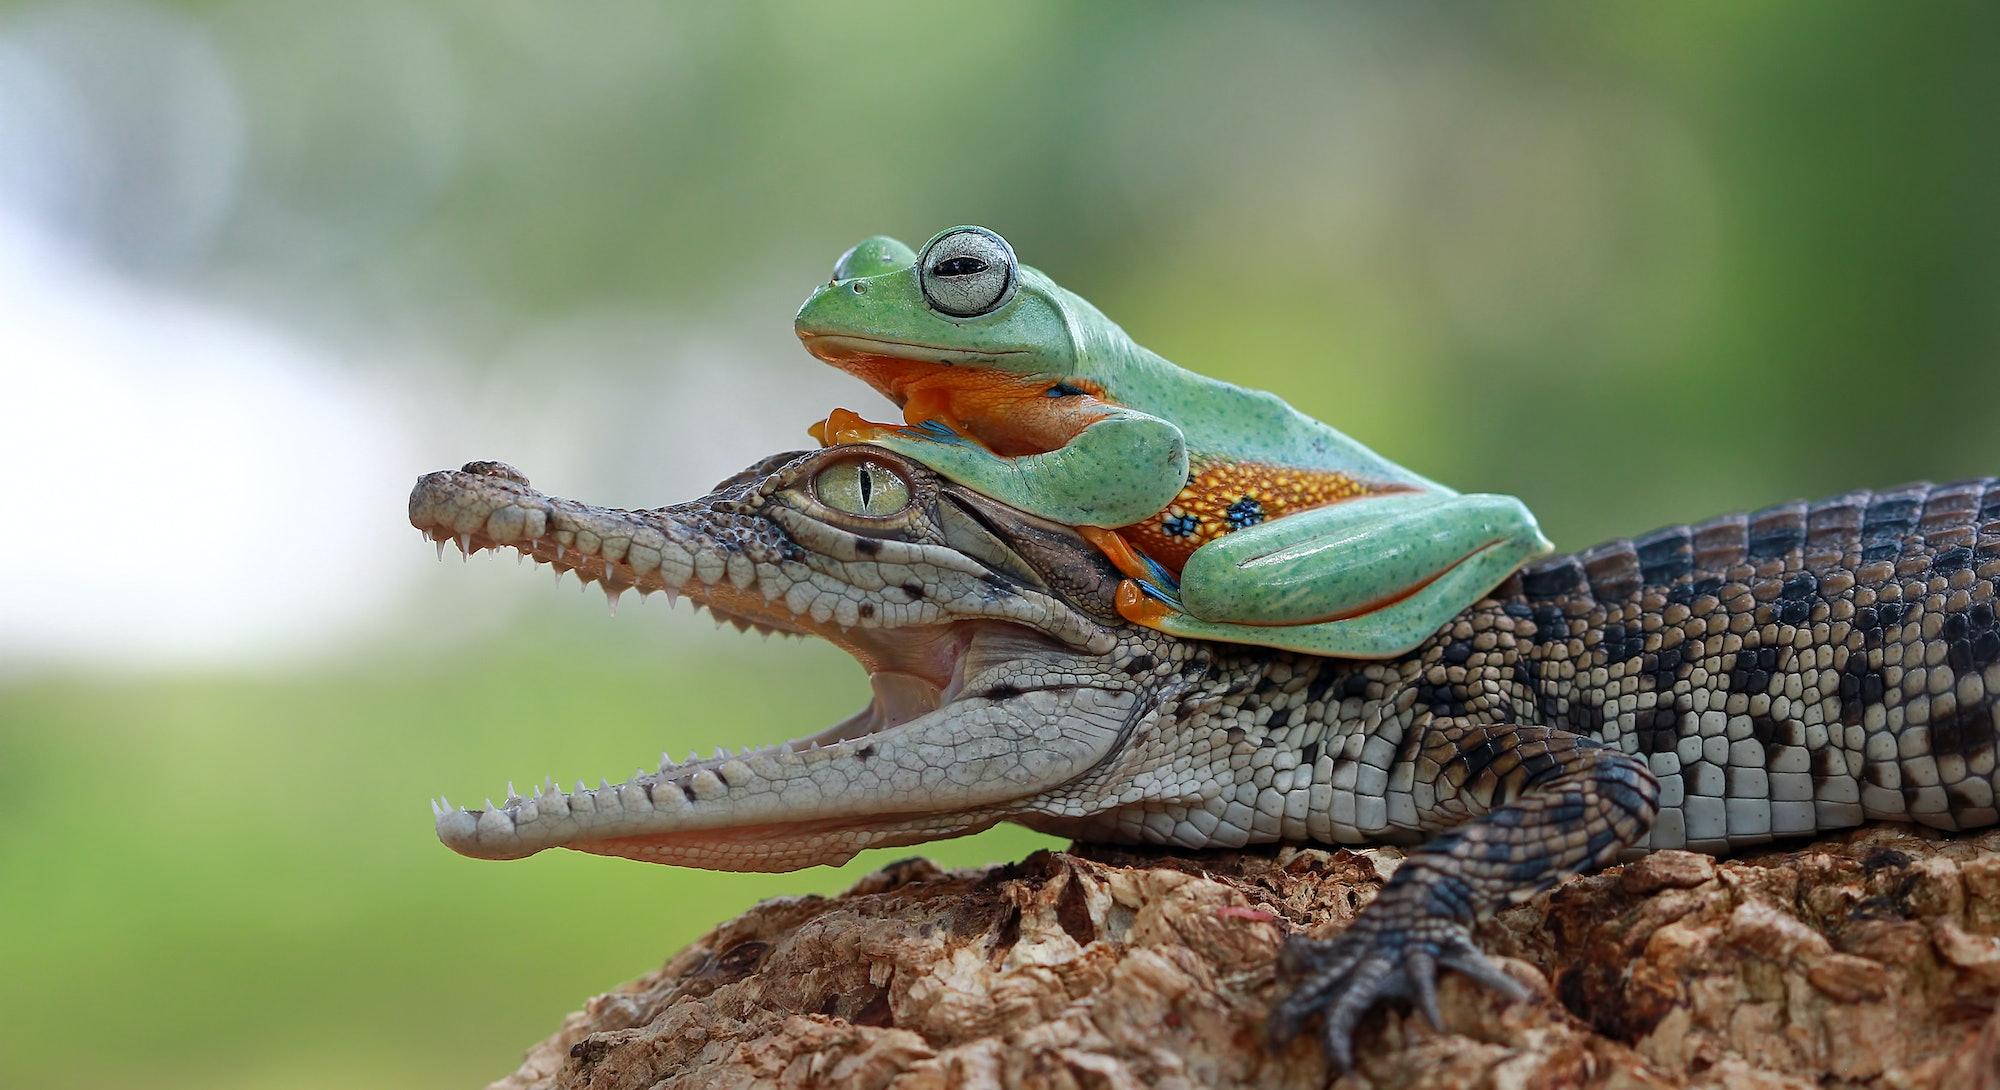 Tree frog sitting on tiny crocodile